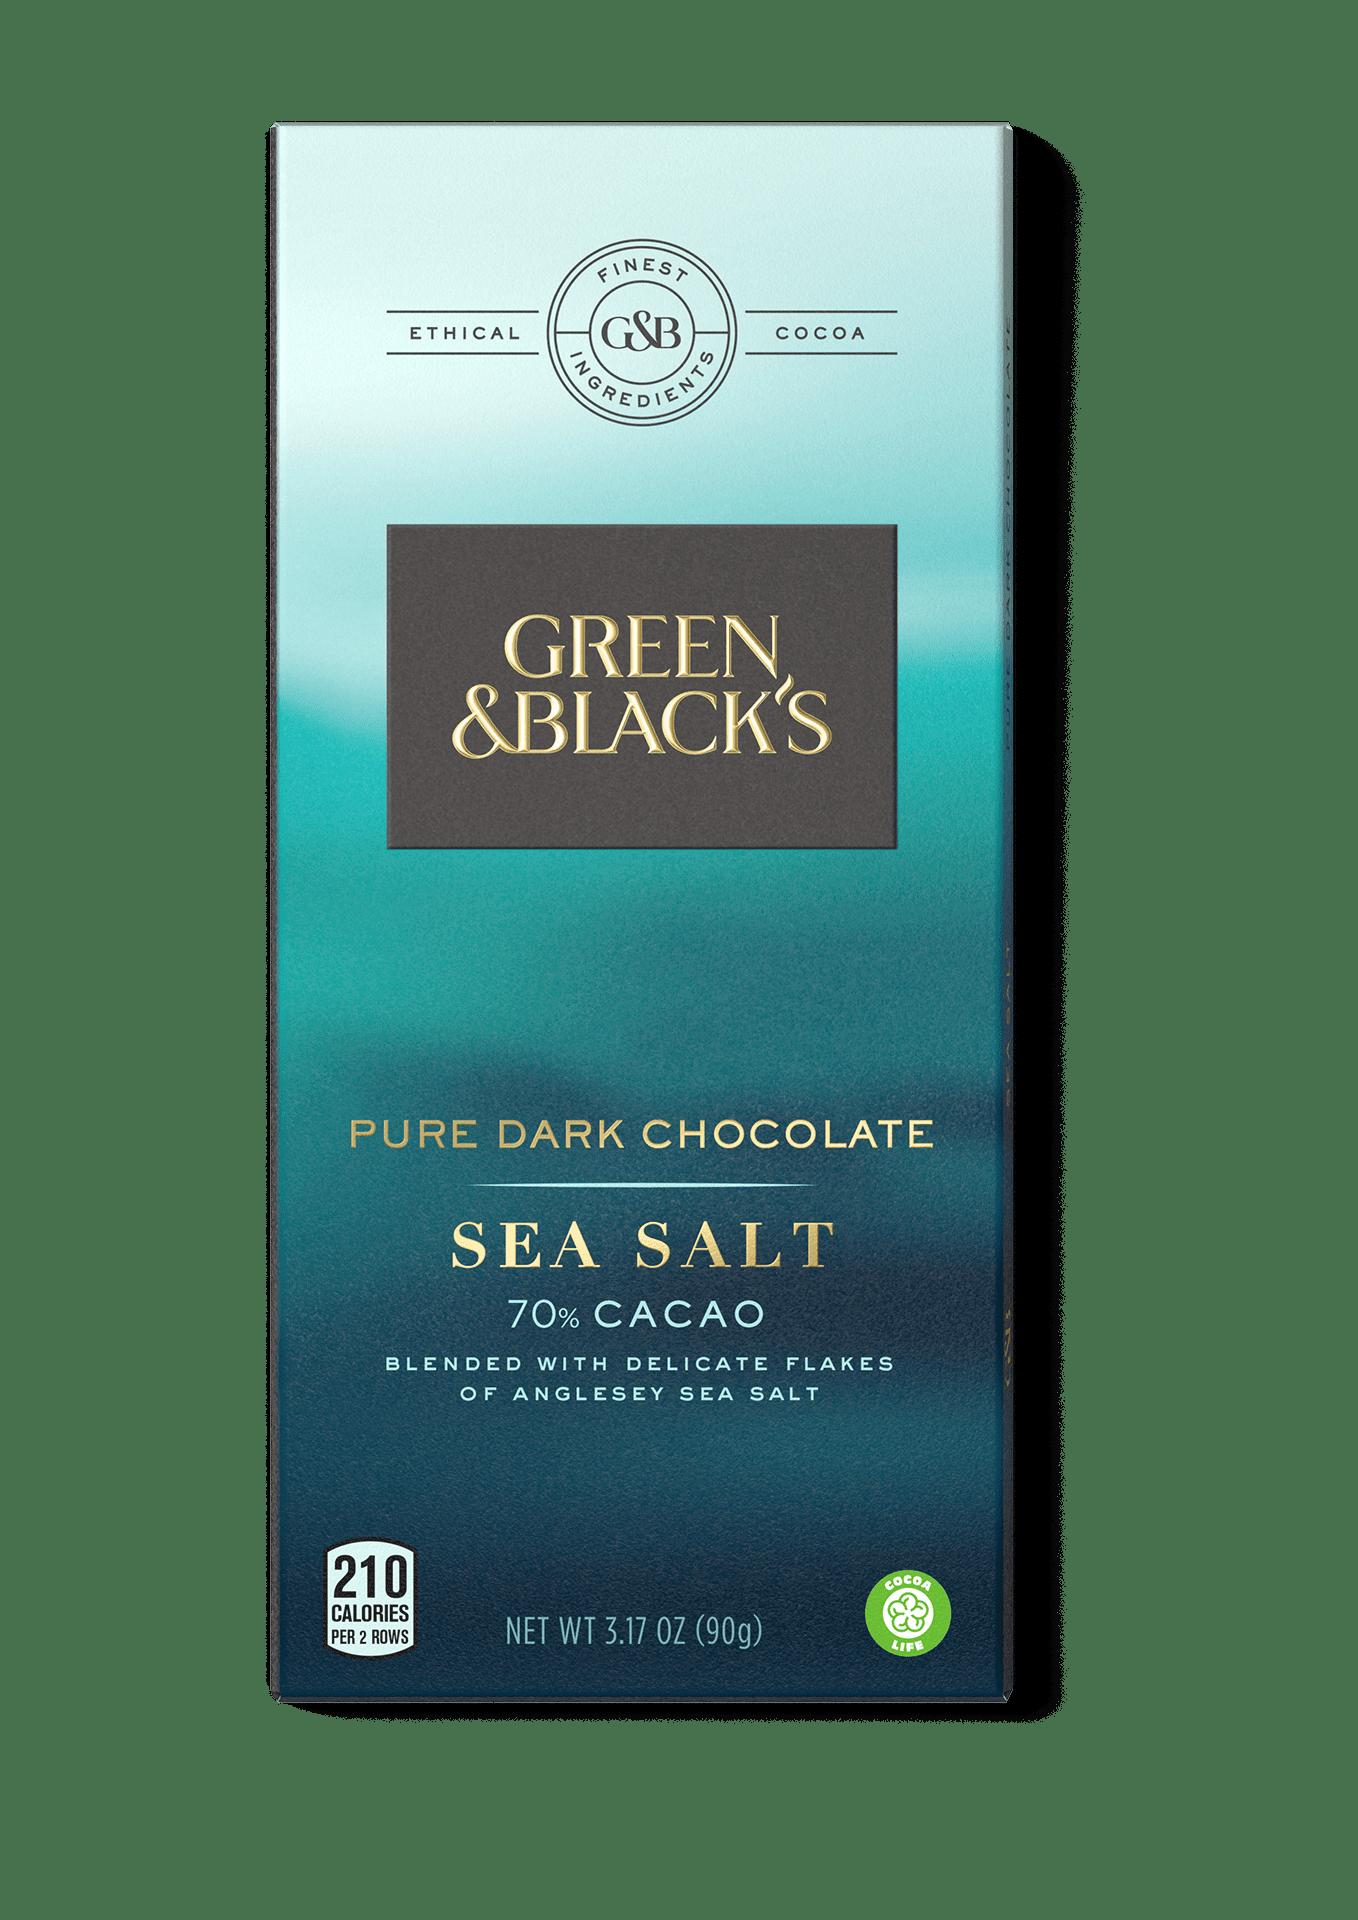 Green and Black's Sea Salt 70% Cacao Pure Dark Chocolate 3.17 oz. Bars by Mondelez